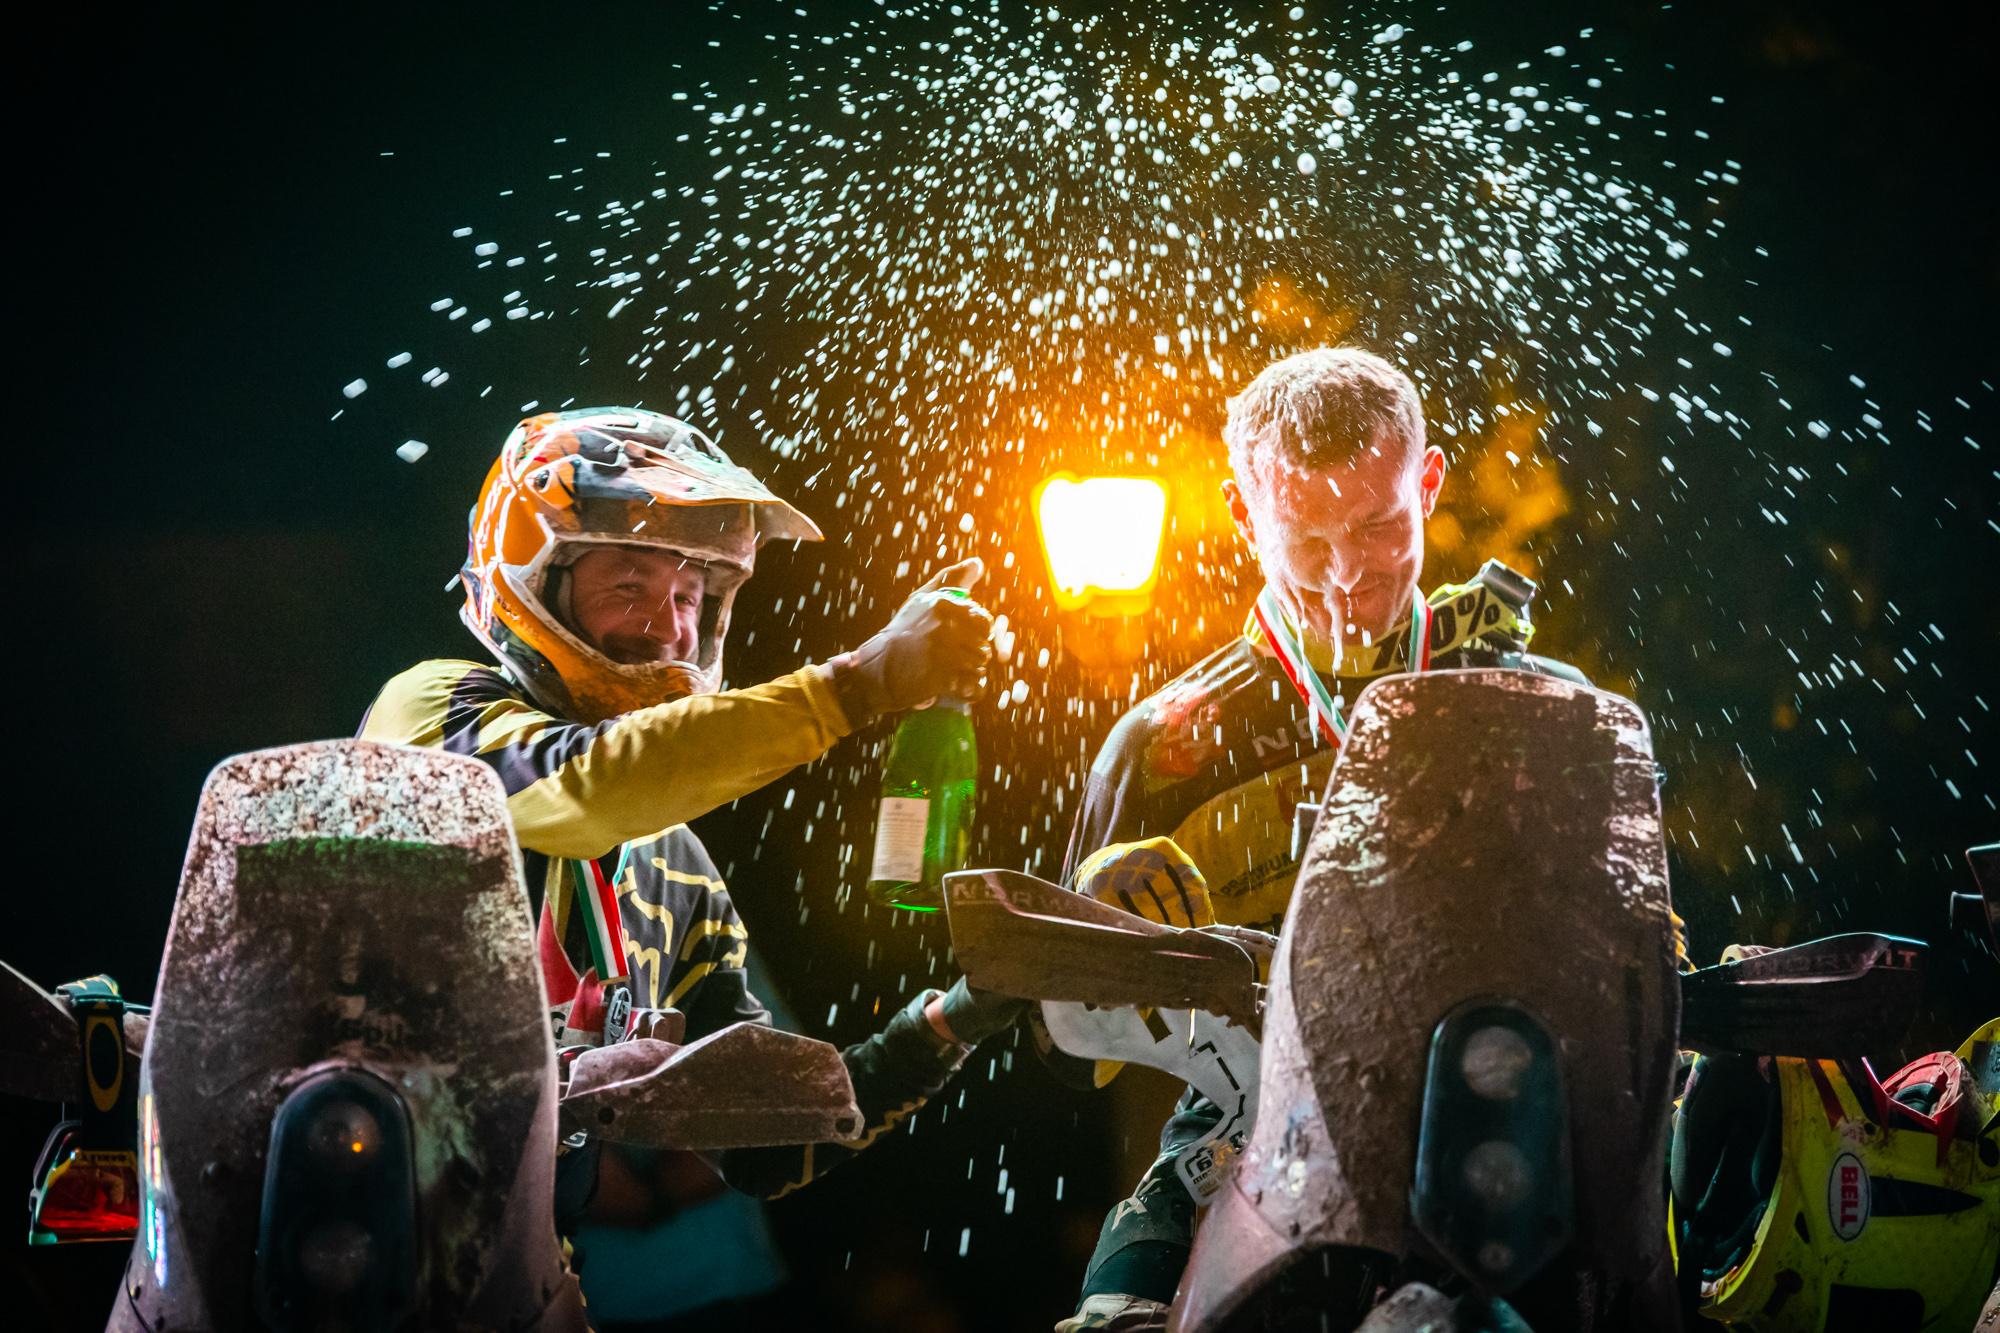 Jan Brabec čtvrtý vMS dálkových rally. Motokrosař propadl Dakaru